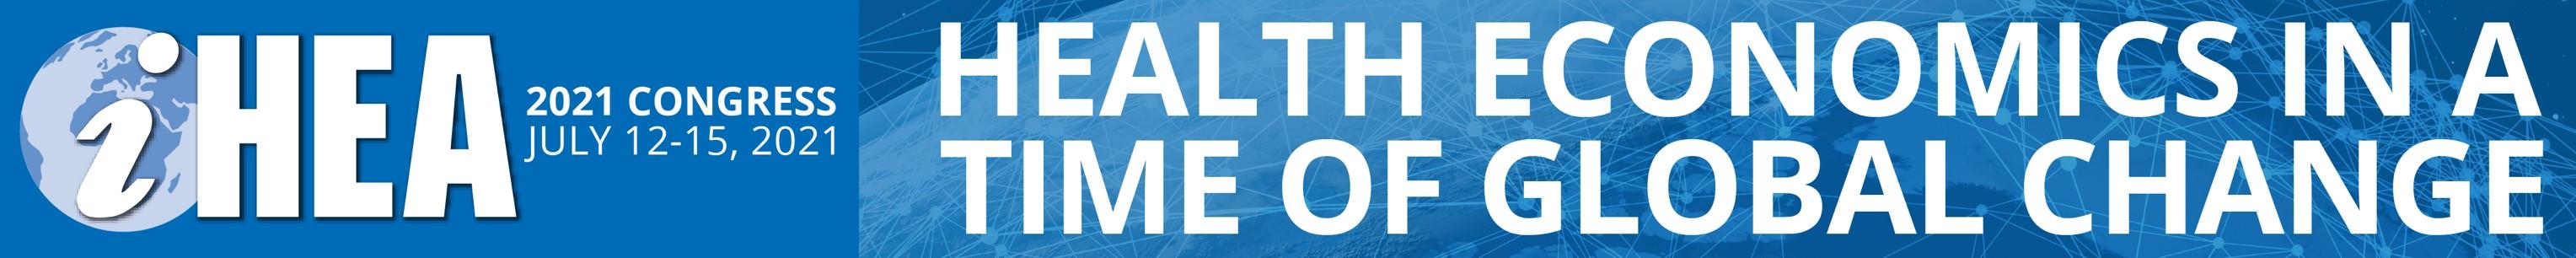 2021 World Congress on Health Economics